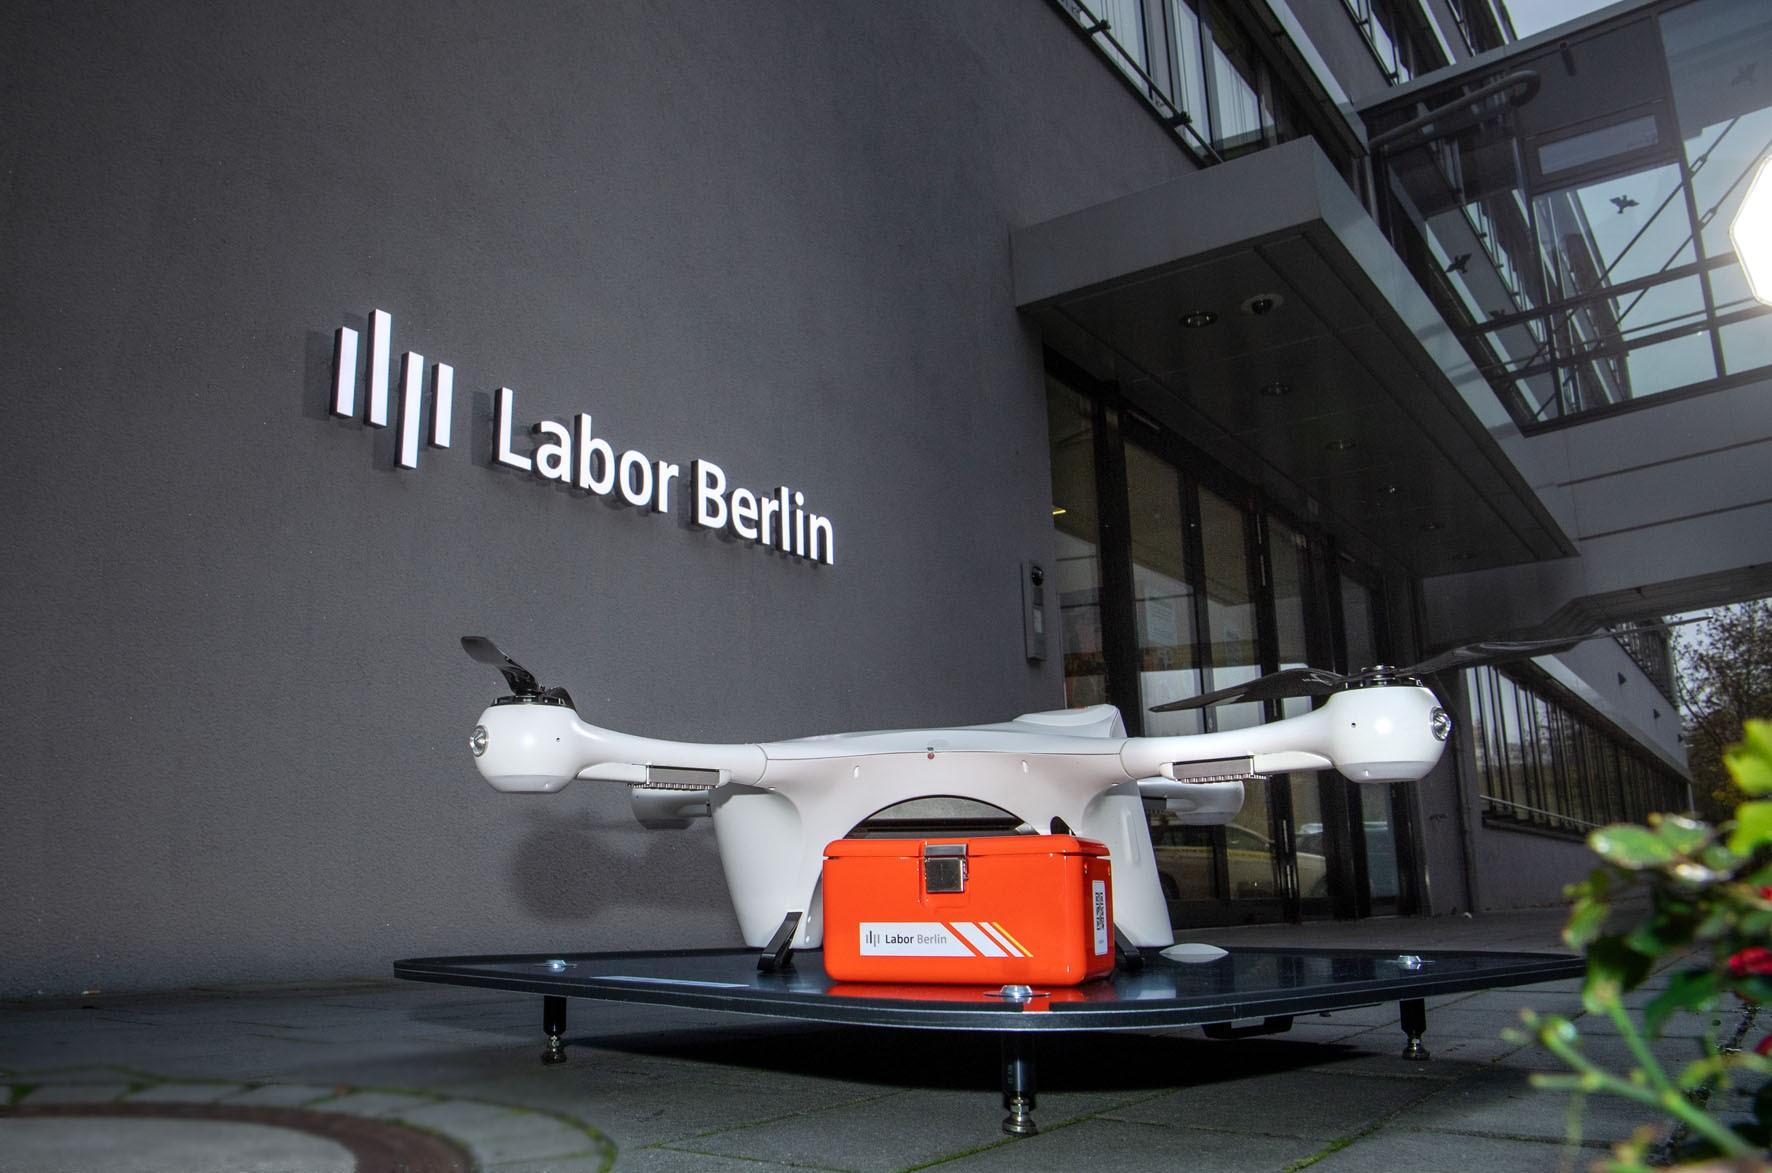 Labor Berlin